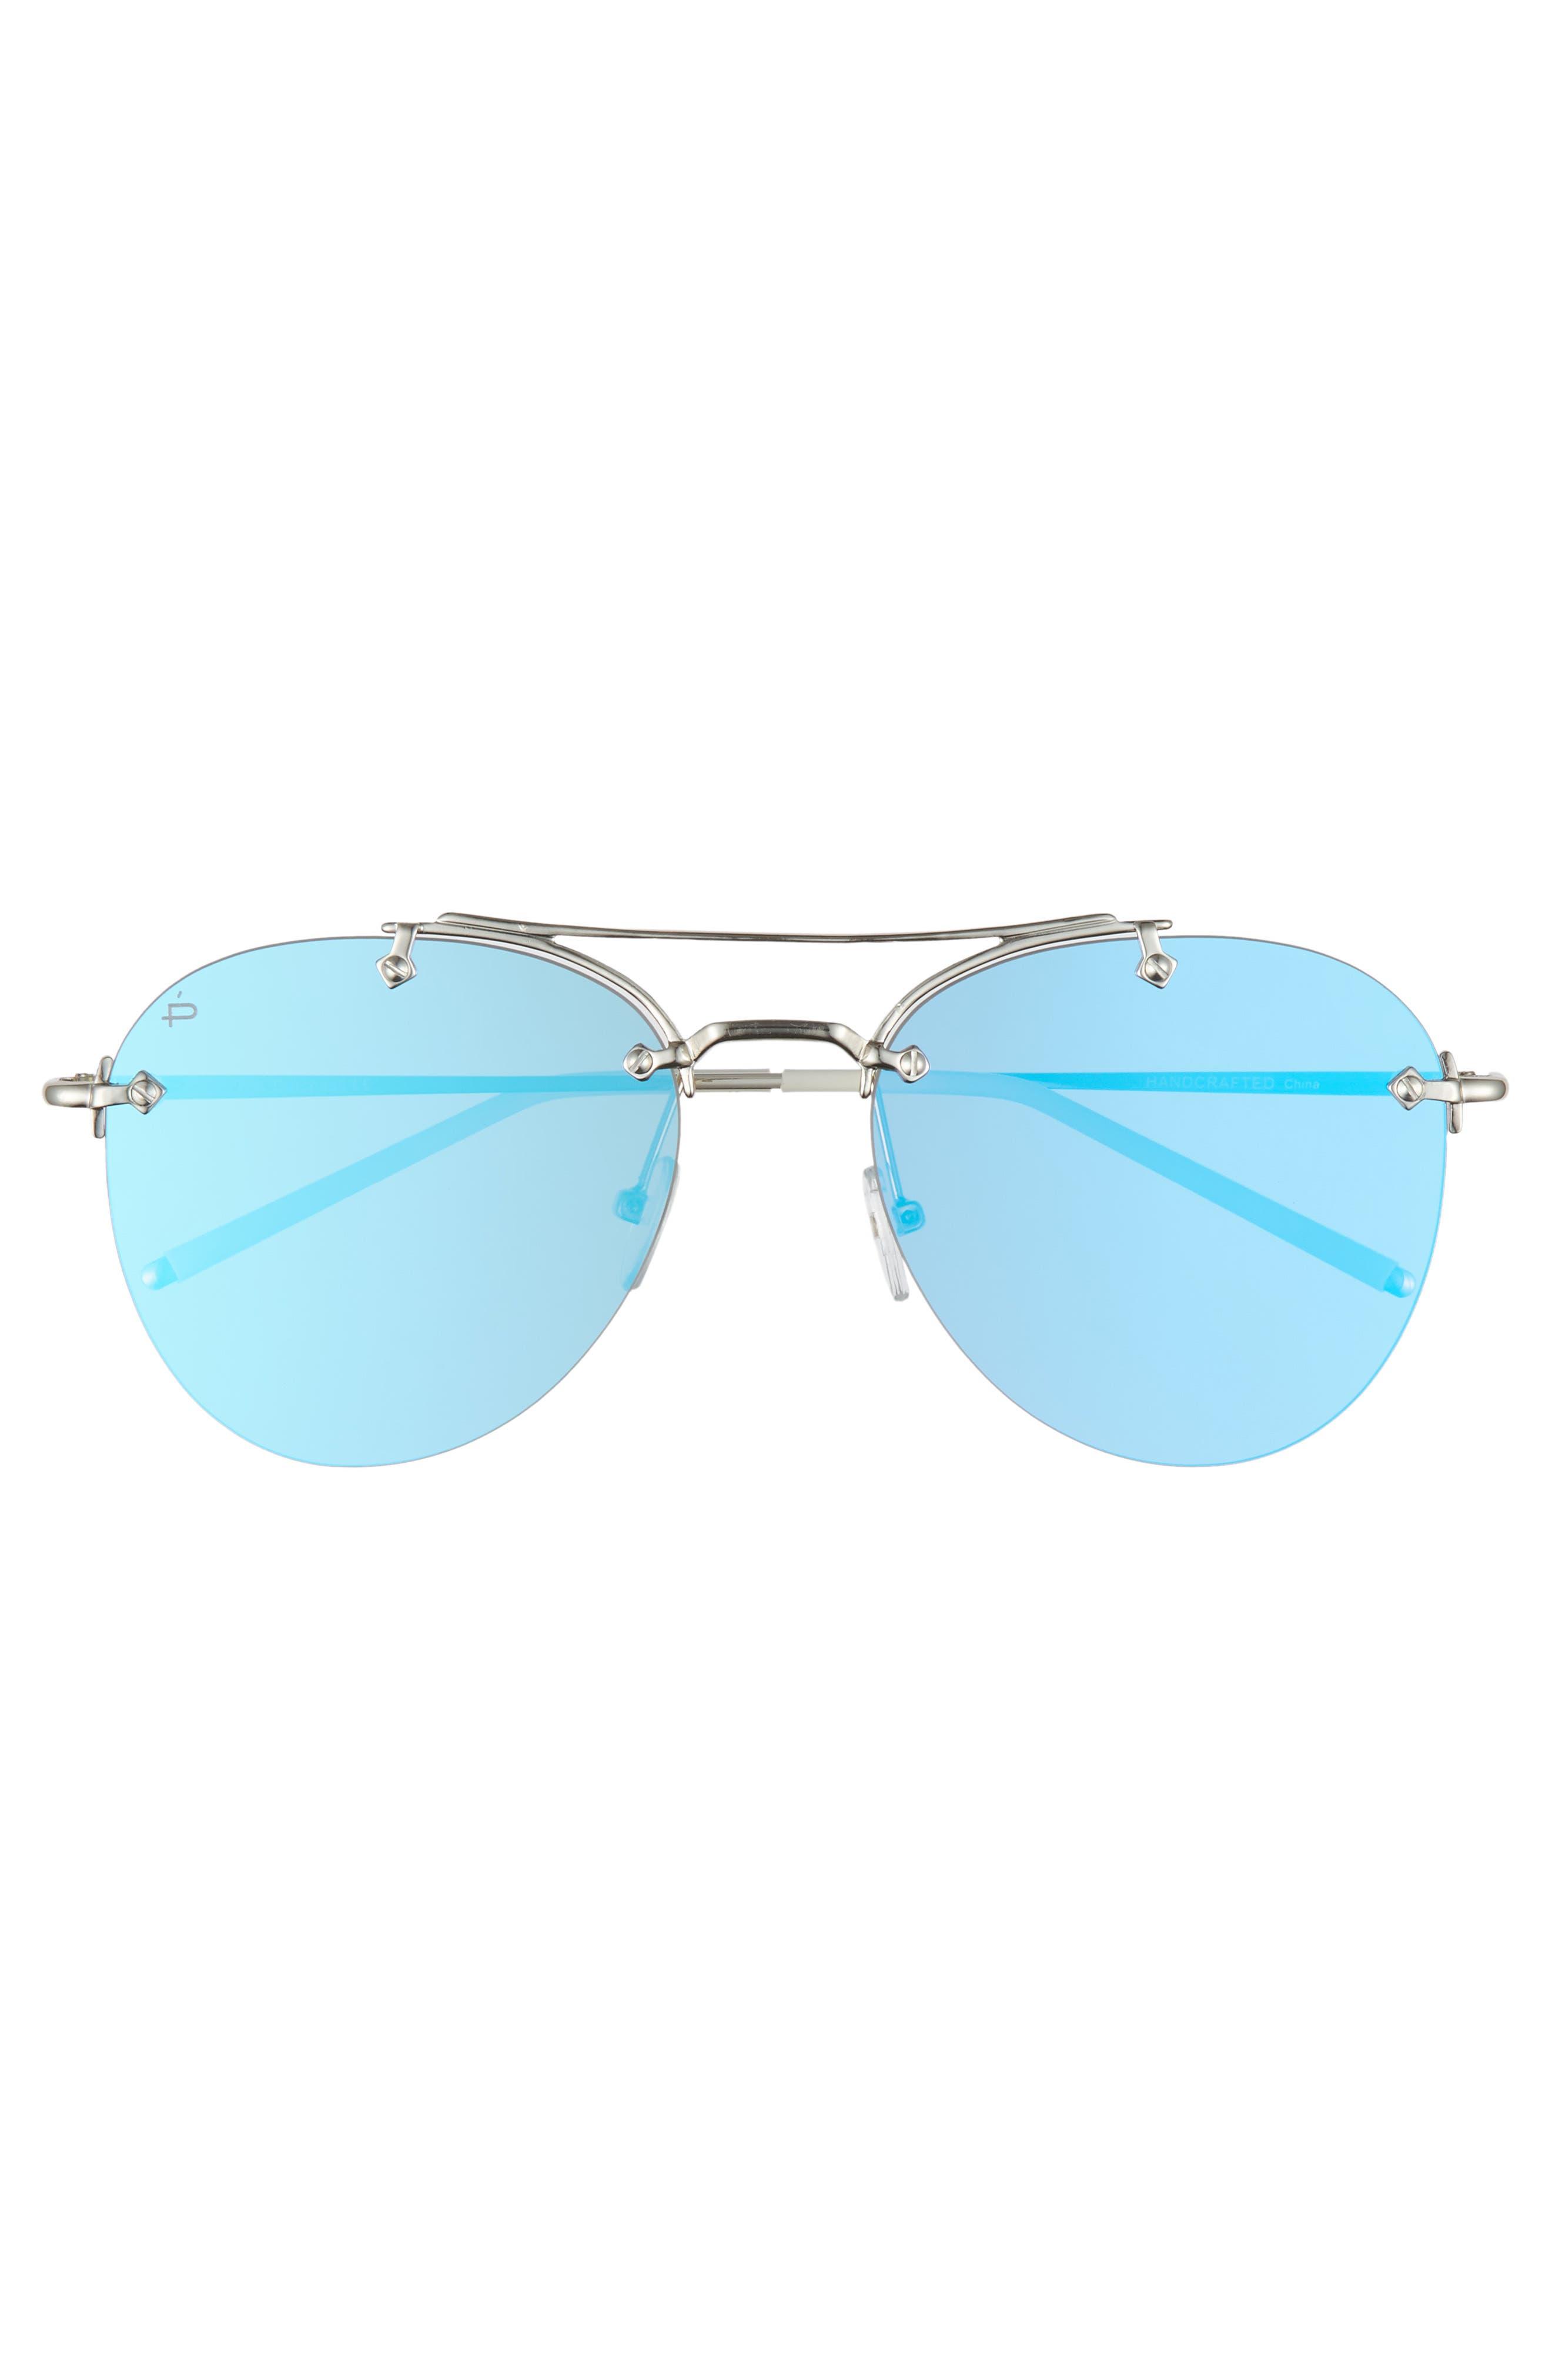 Privé Revaux The Dutchess 57mm Aviator Sunglasses,                             Alternate thumbnail 3, color,                             040